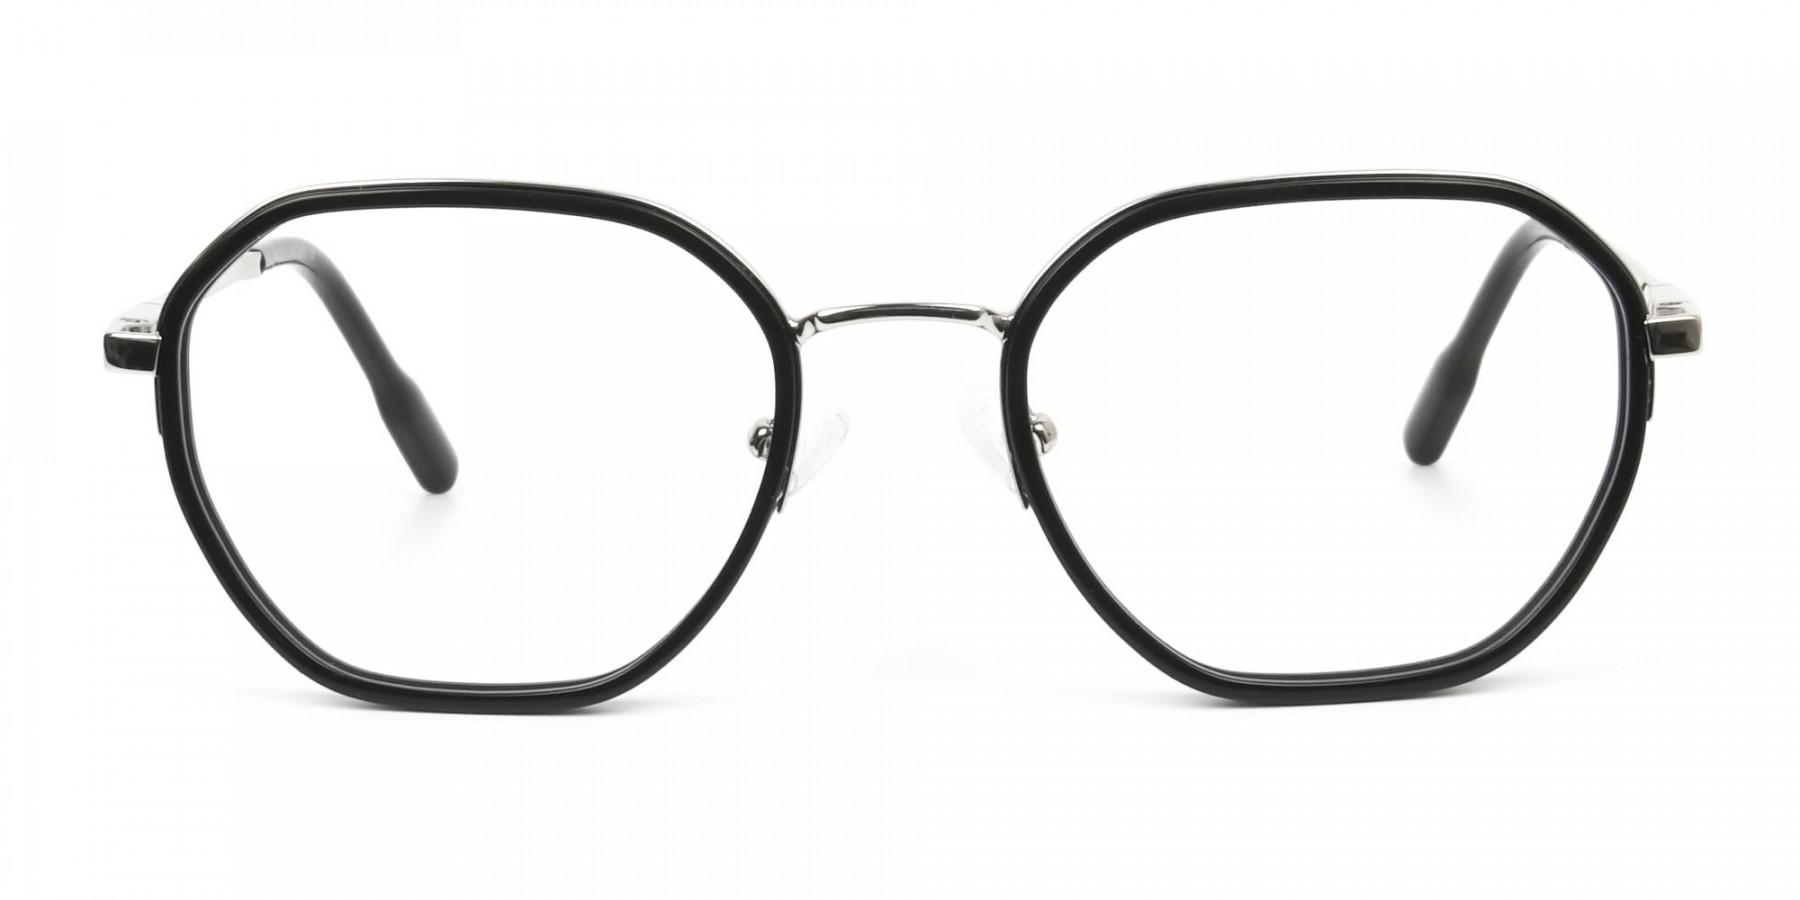 Wayfarer Black and Silver Geometric Glasses - 1